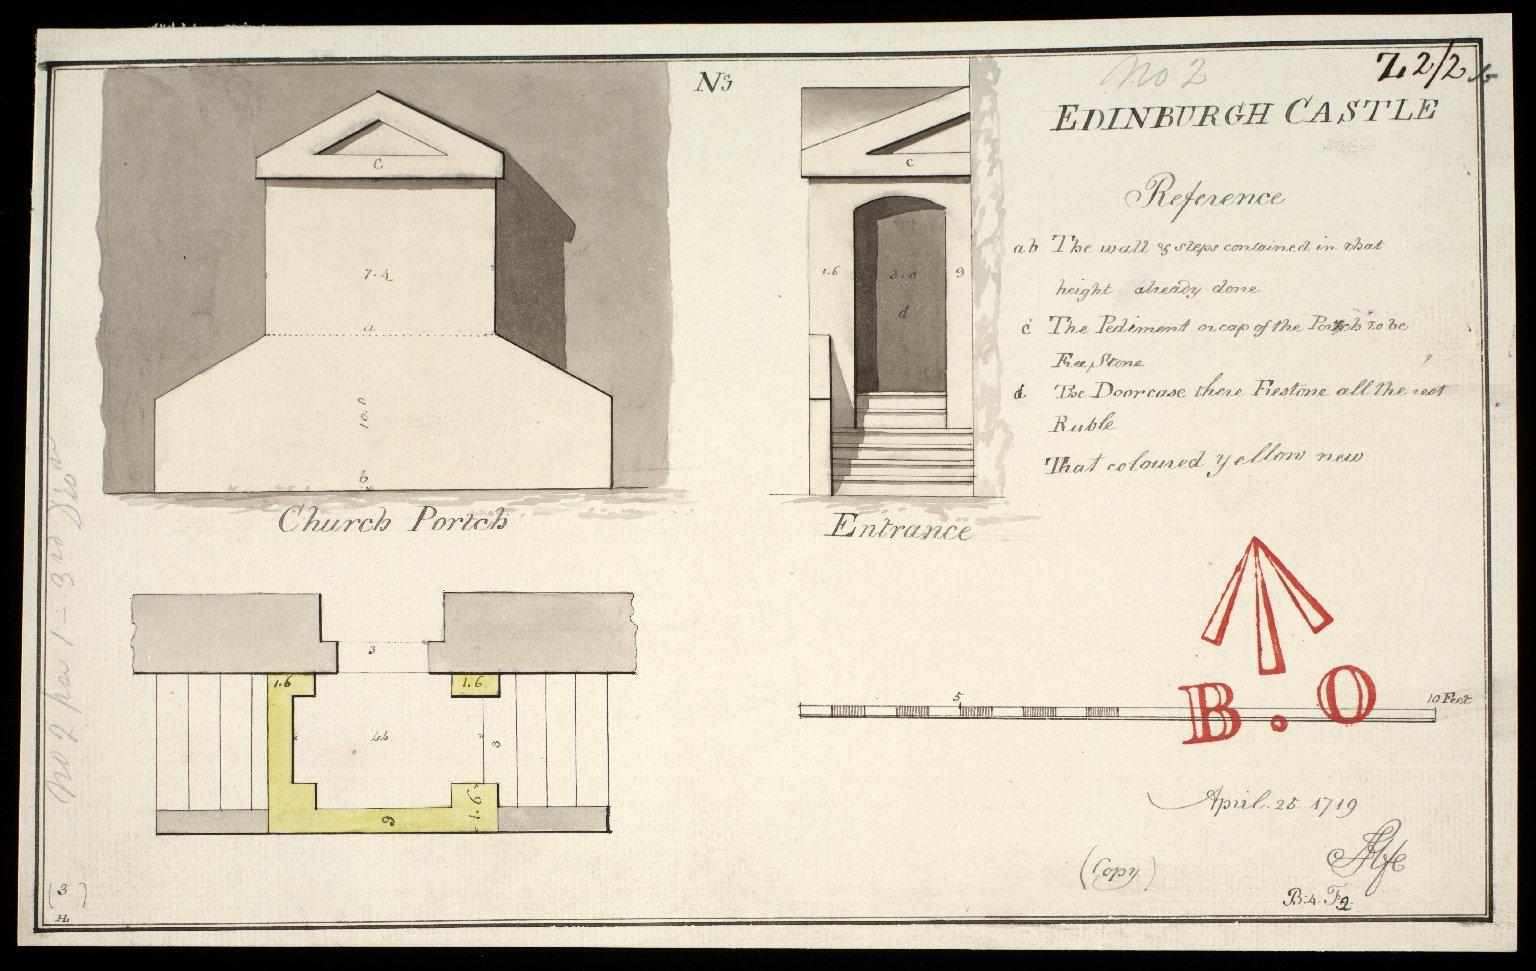 Church Portch; No.I; Edinburgh Castle; April 25 1719 copy [1 of 1]